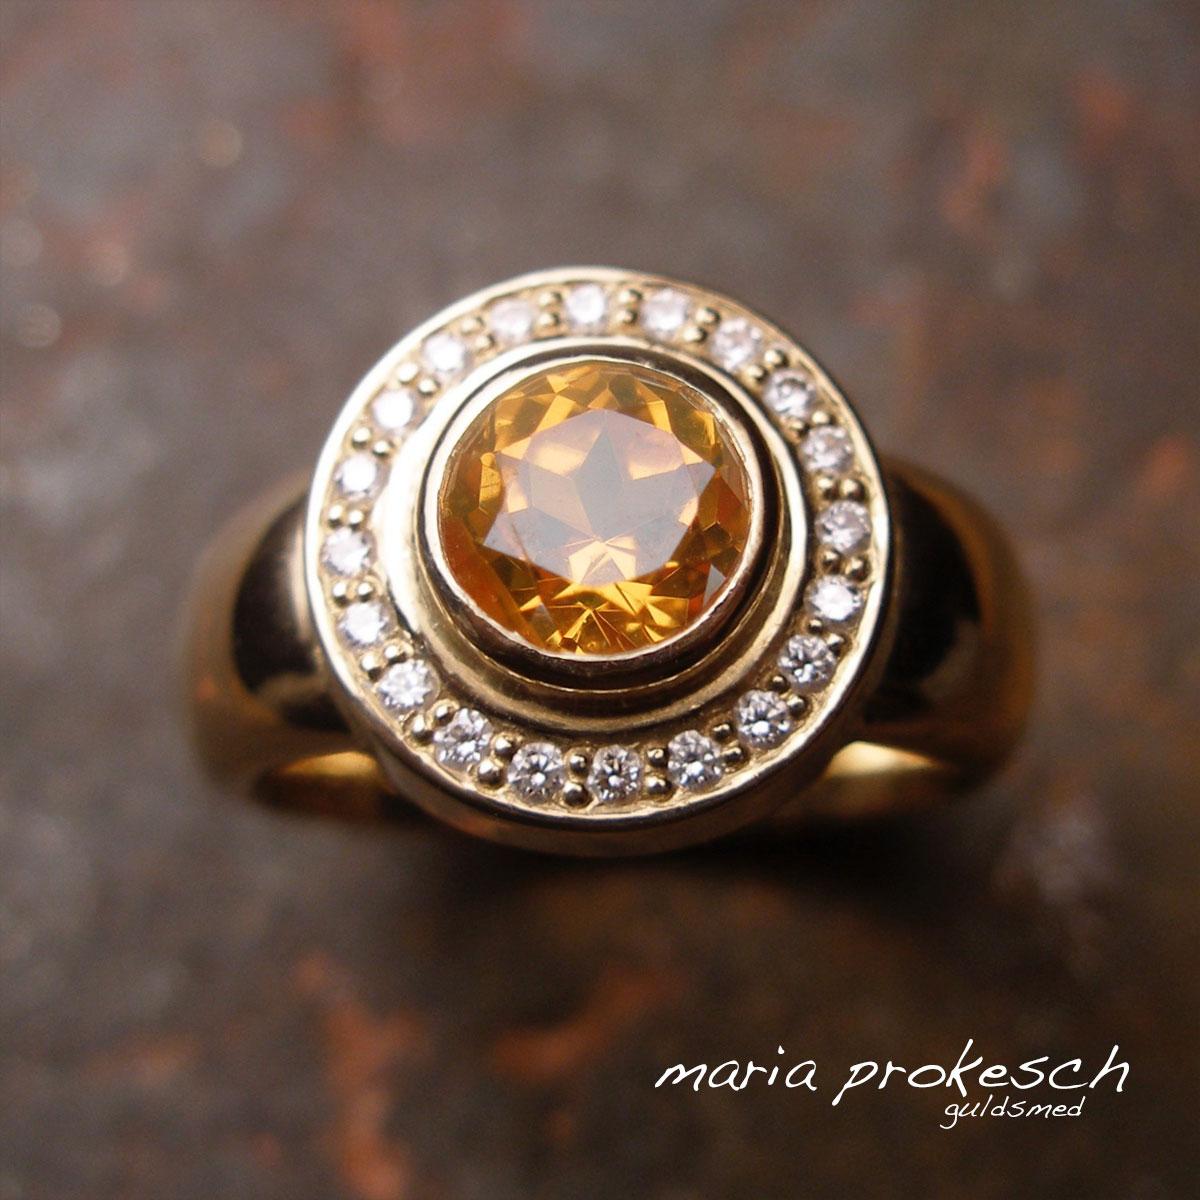 Rosetring i 18 kt guld med orange facetteret mandaringranat. En smuk ædelsten med hvide diamanter rundt om